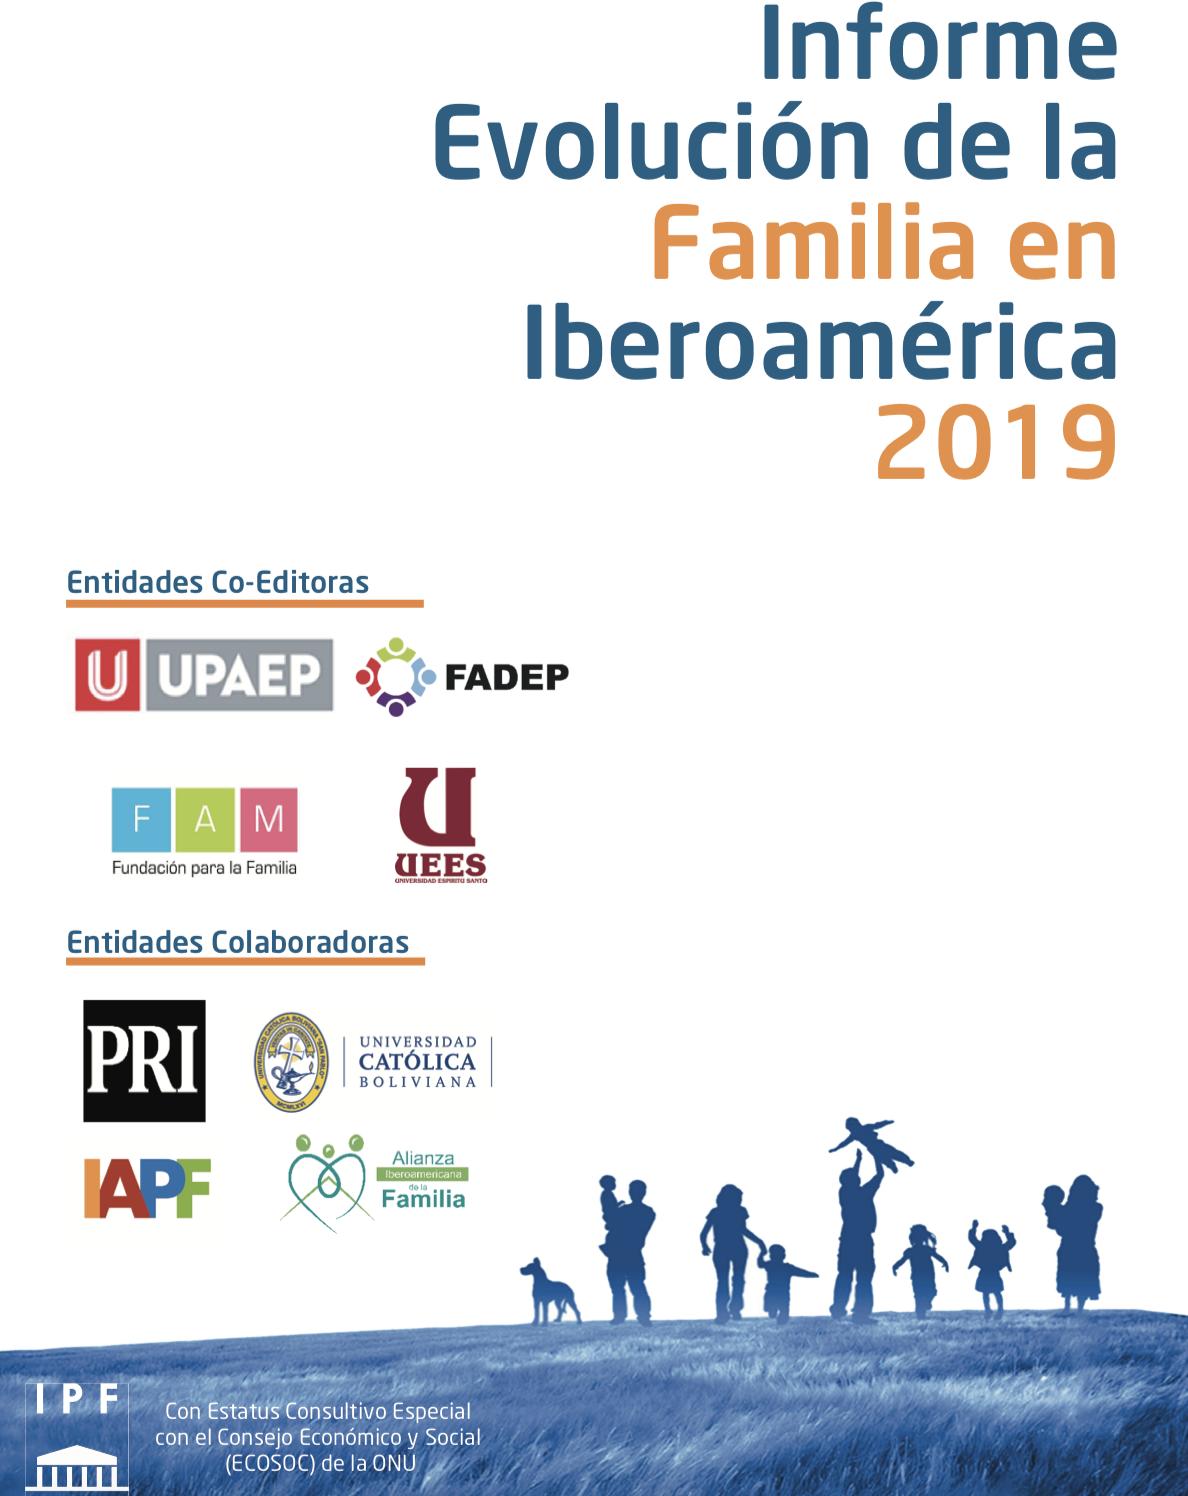 Evolución de la Familia en Iberoamérica